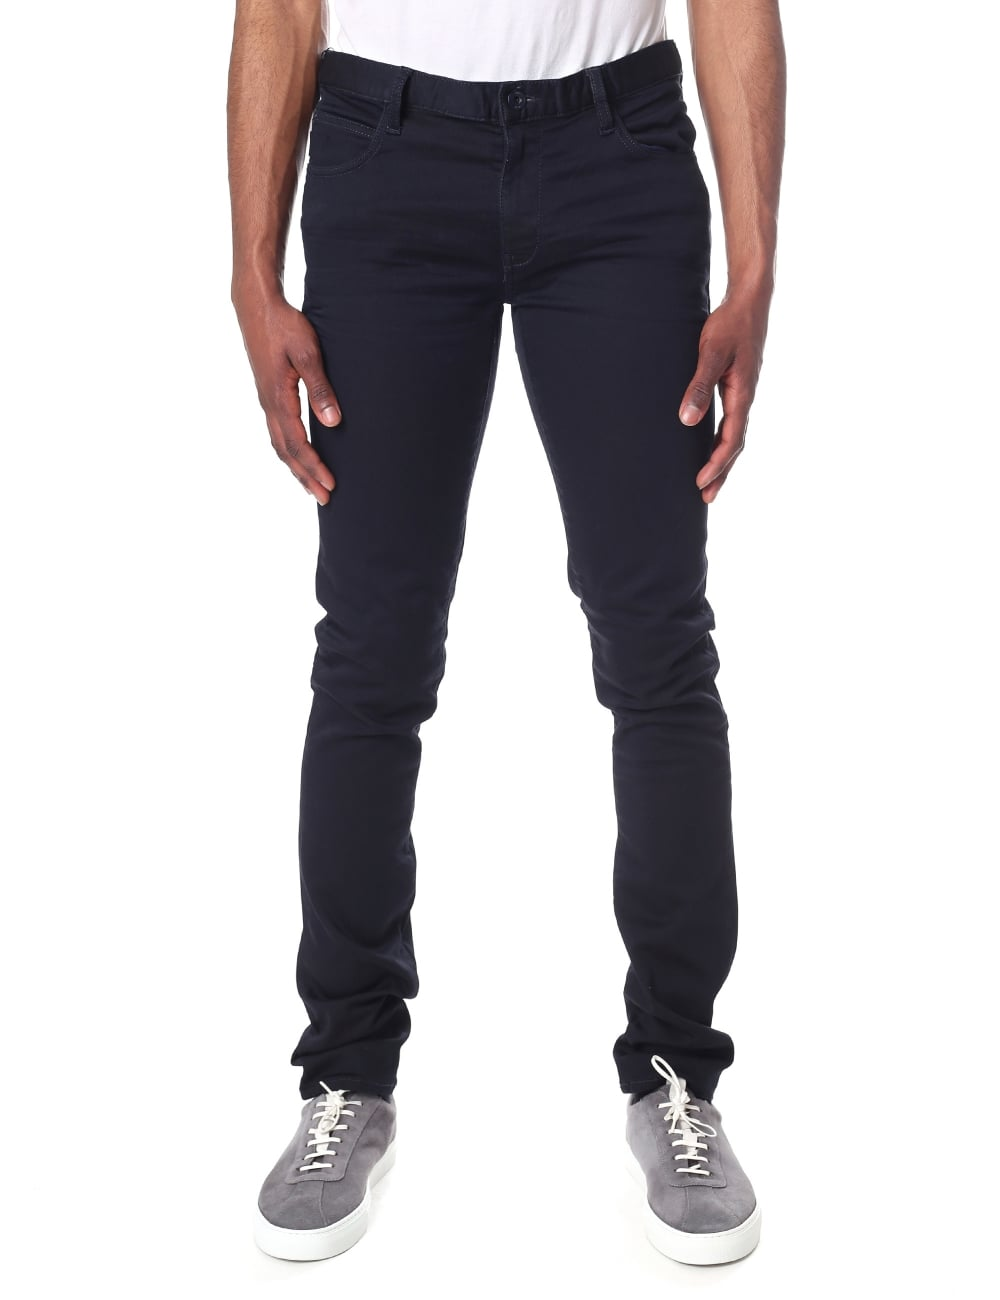 exquisite design 50% price where to buy Emporio Armani Men's Slim Fit Jean